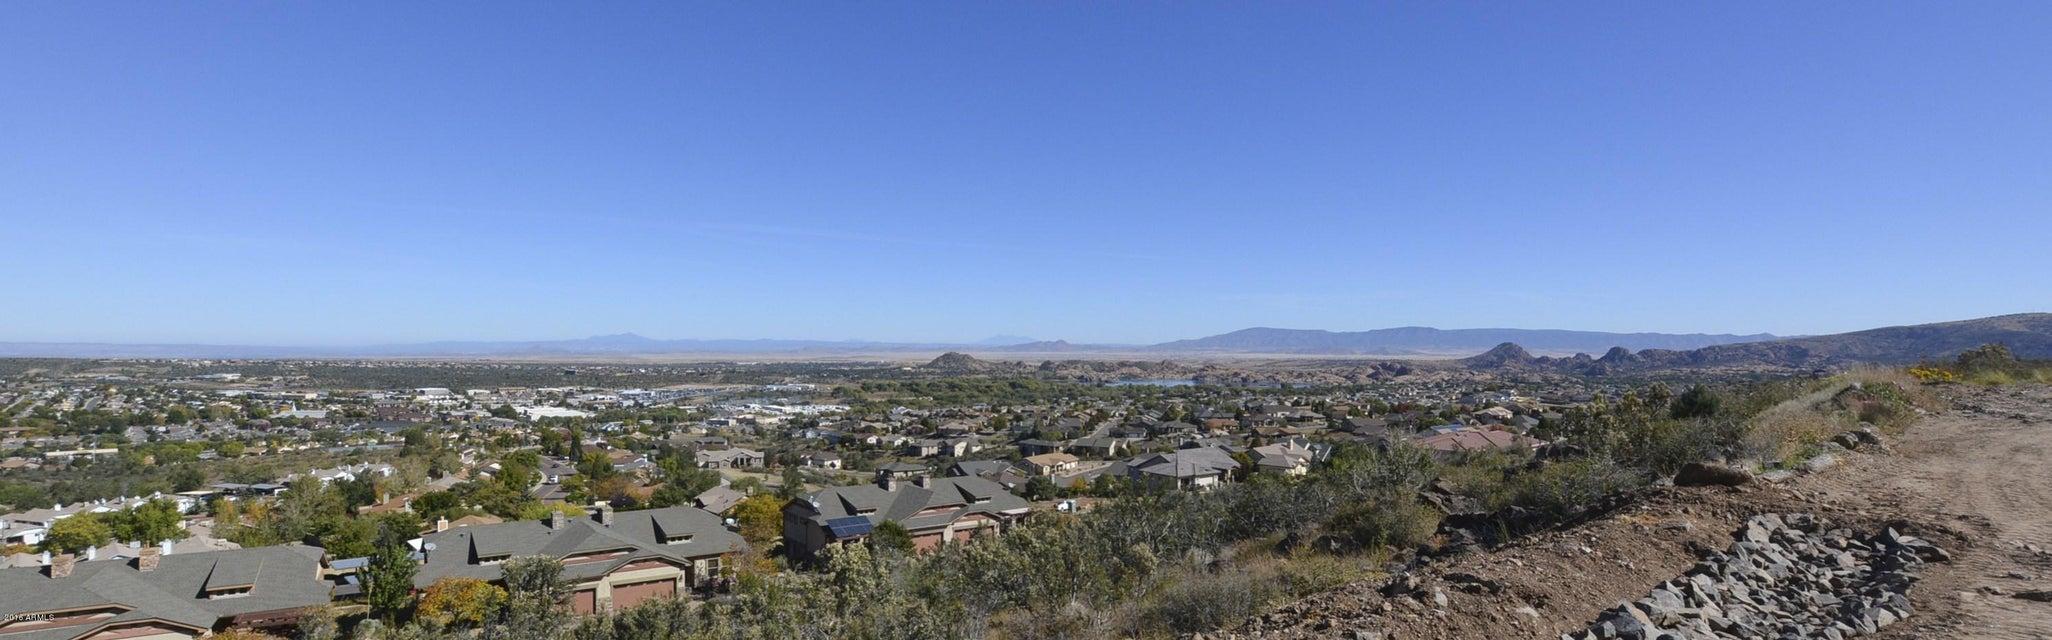 MLS 5517867 534 OSPREY Trail, Prescott, AZ Prescott AZ Condo or Townhome